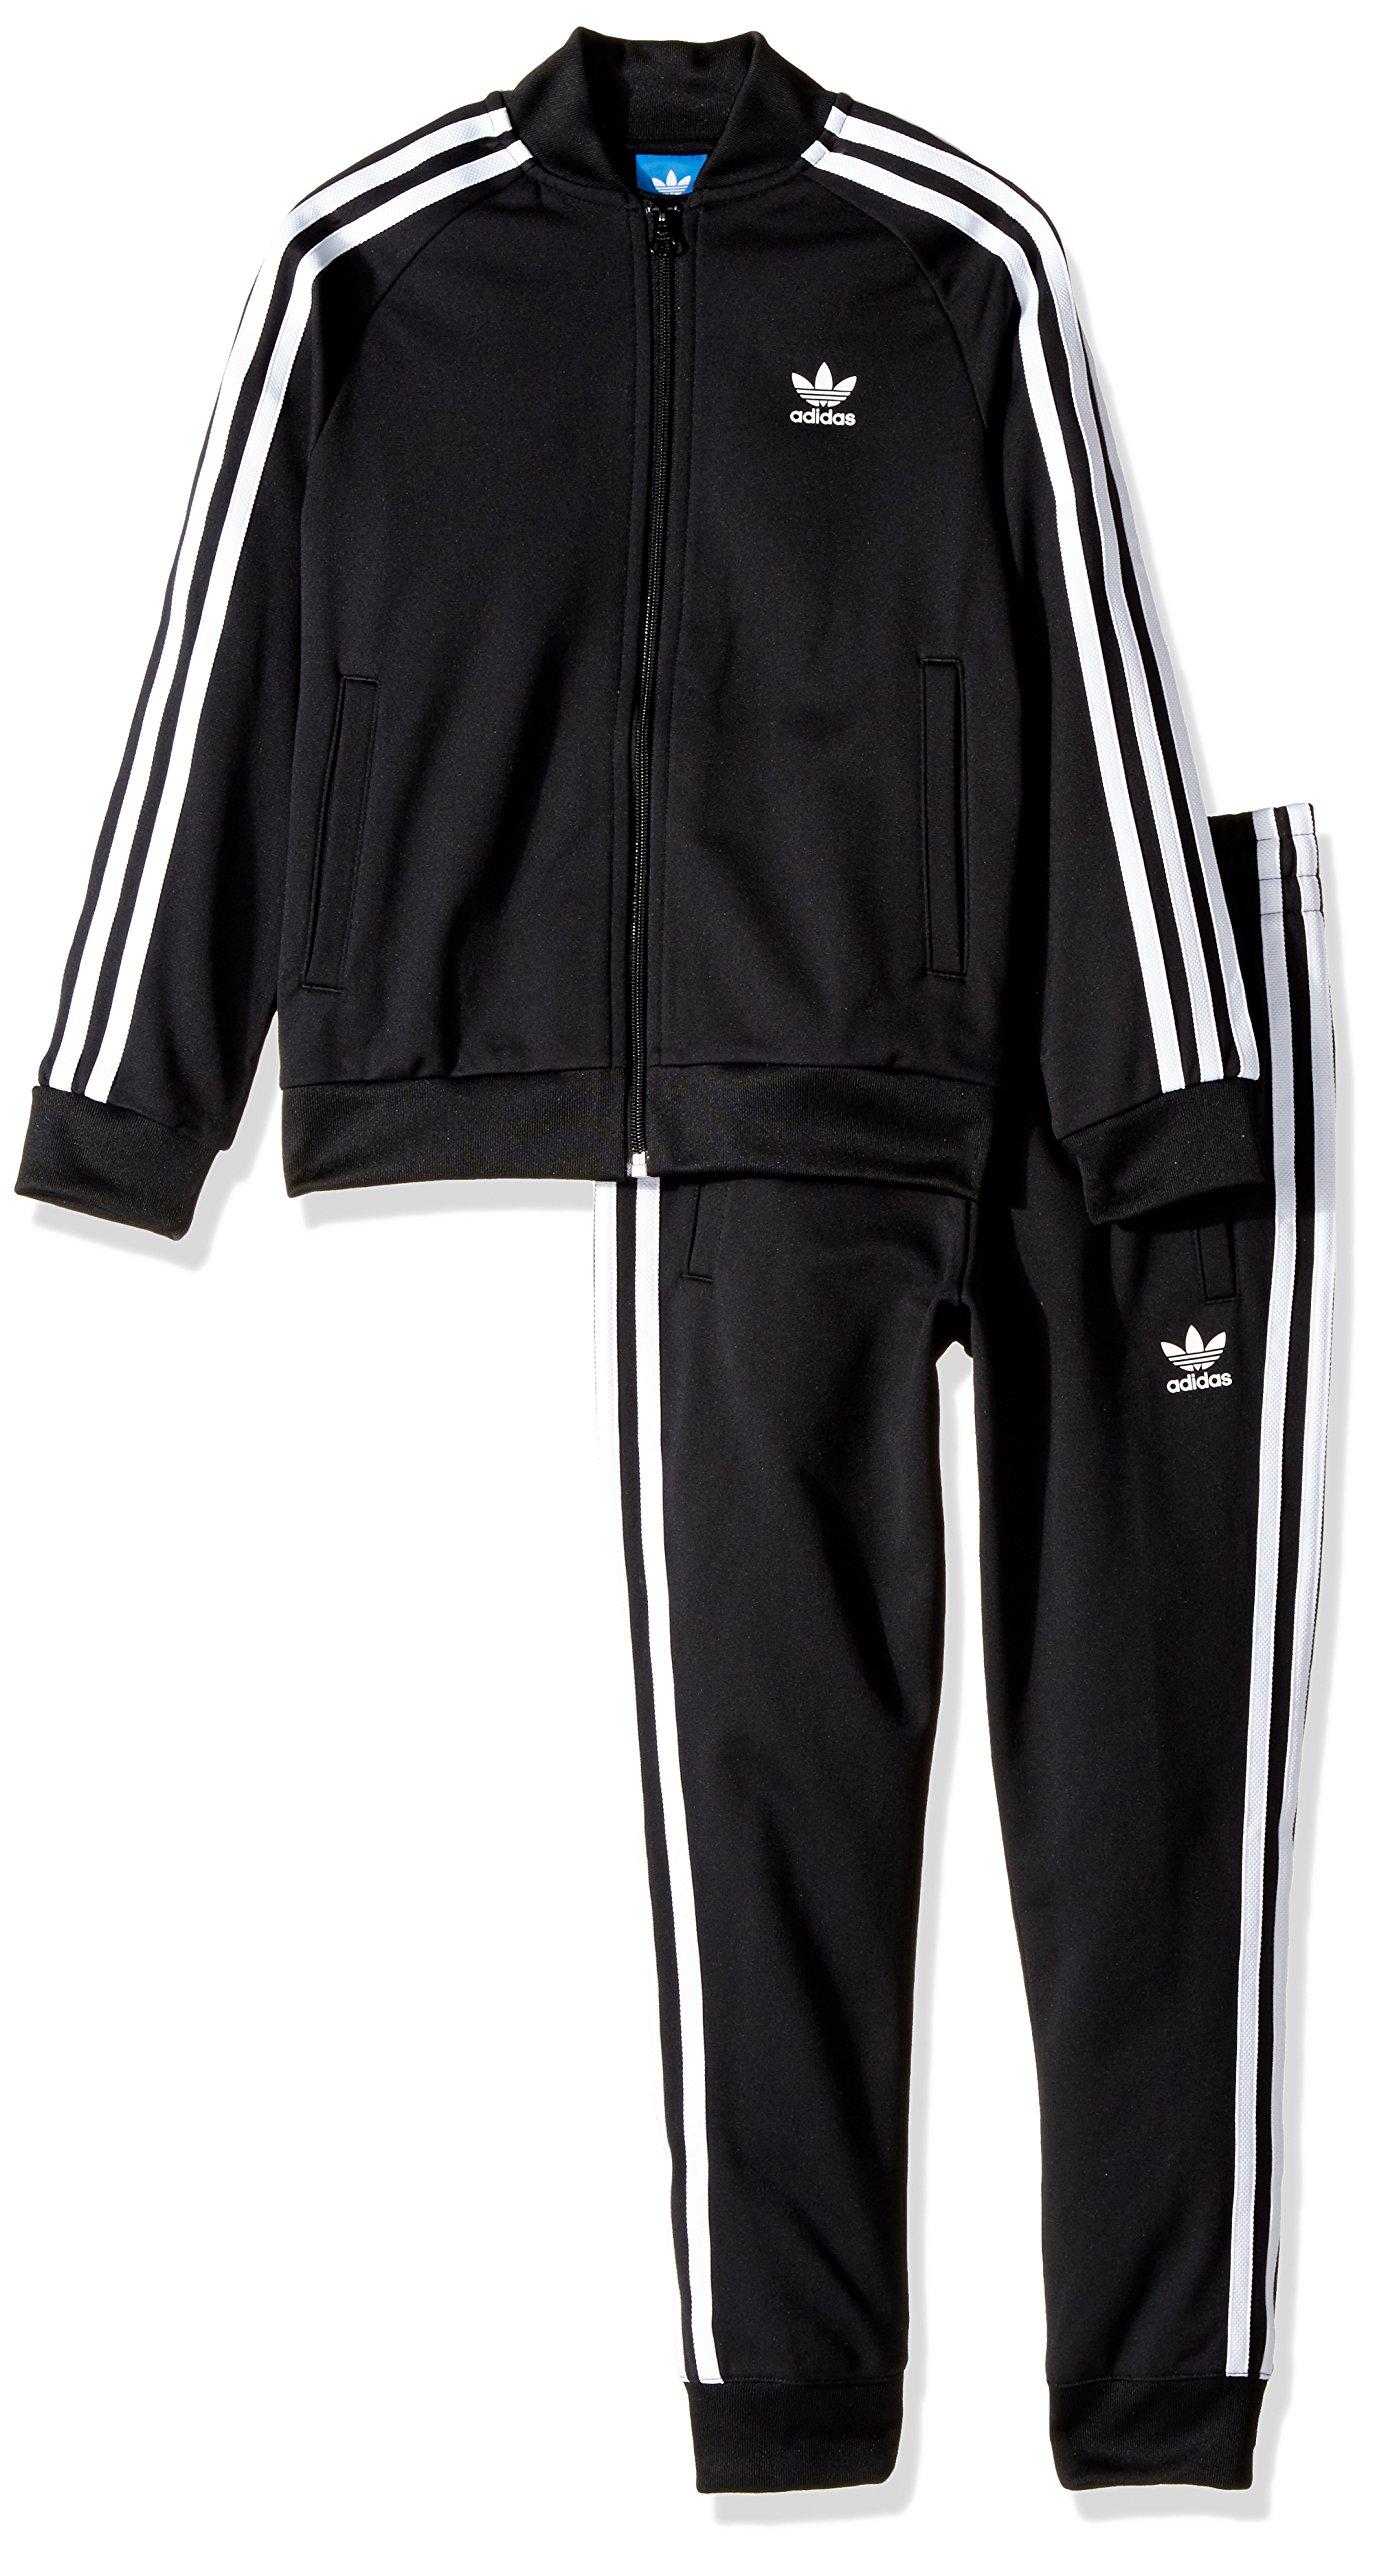 adidas Originals Outerwear | Big Boys' Kids Superstar Track Suit, Top: Black/White Bottom: Black/White, Medium